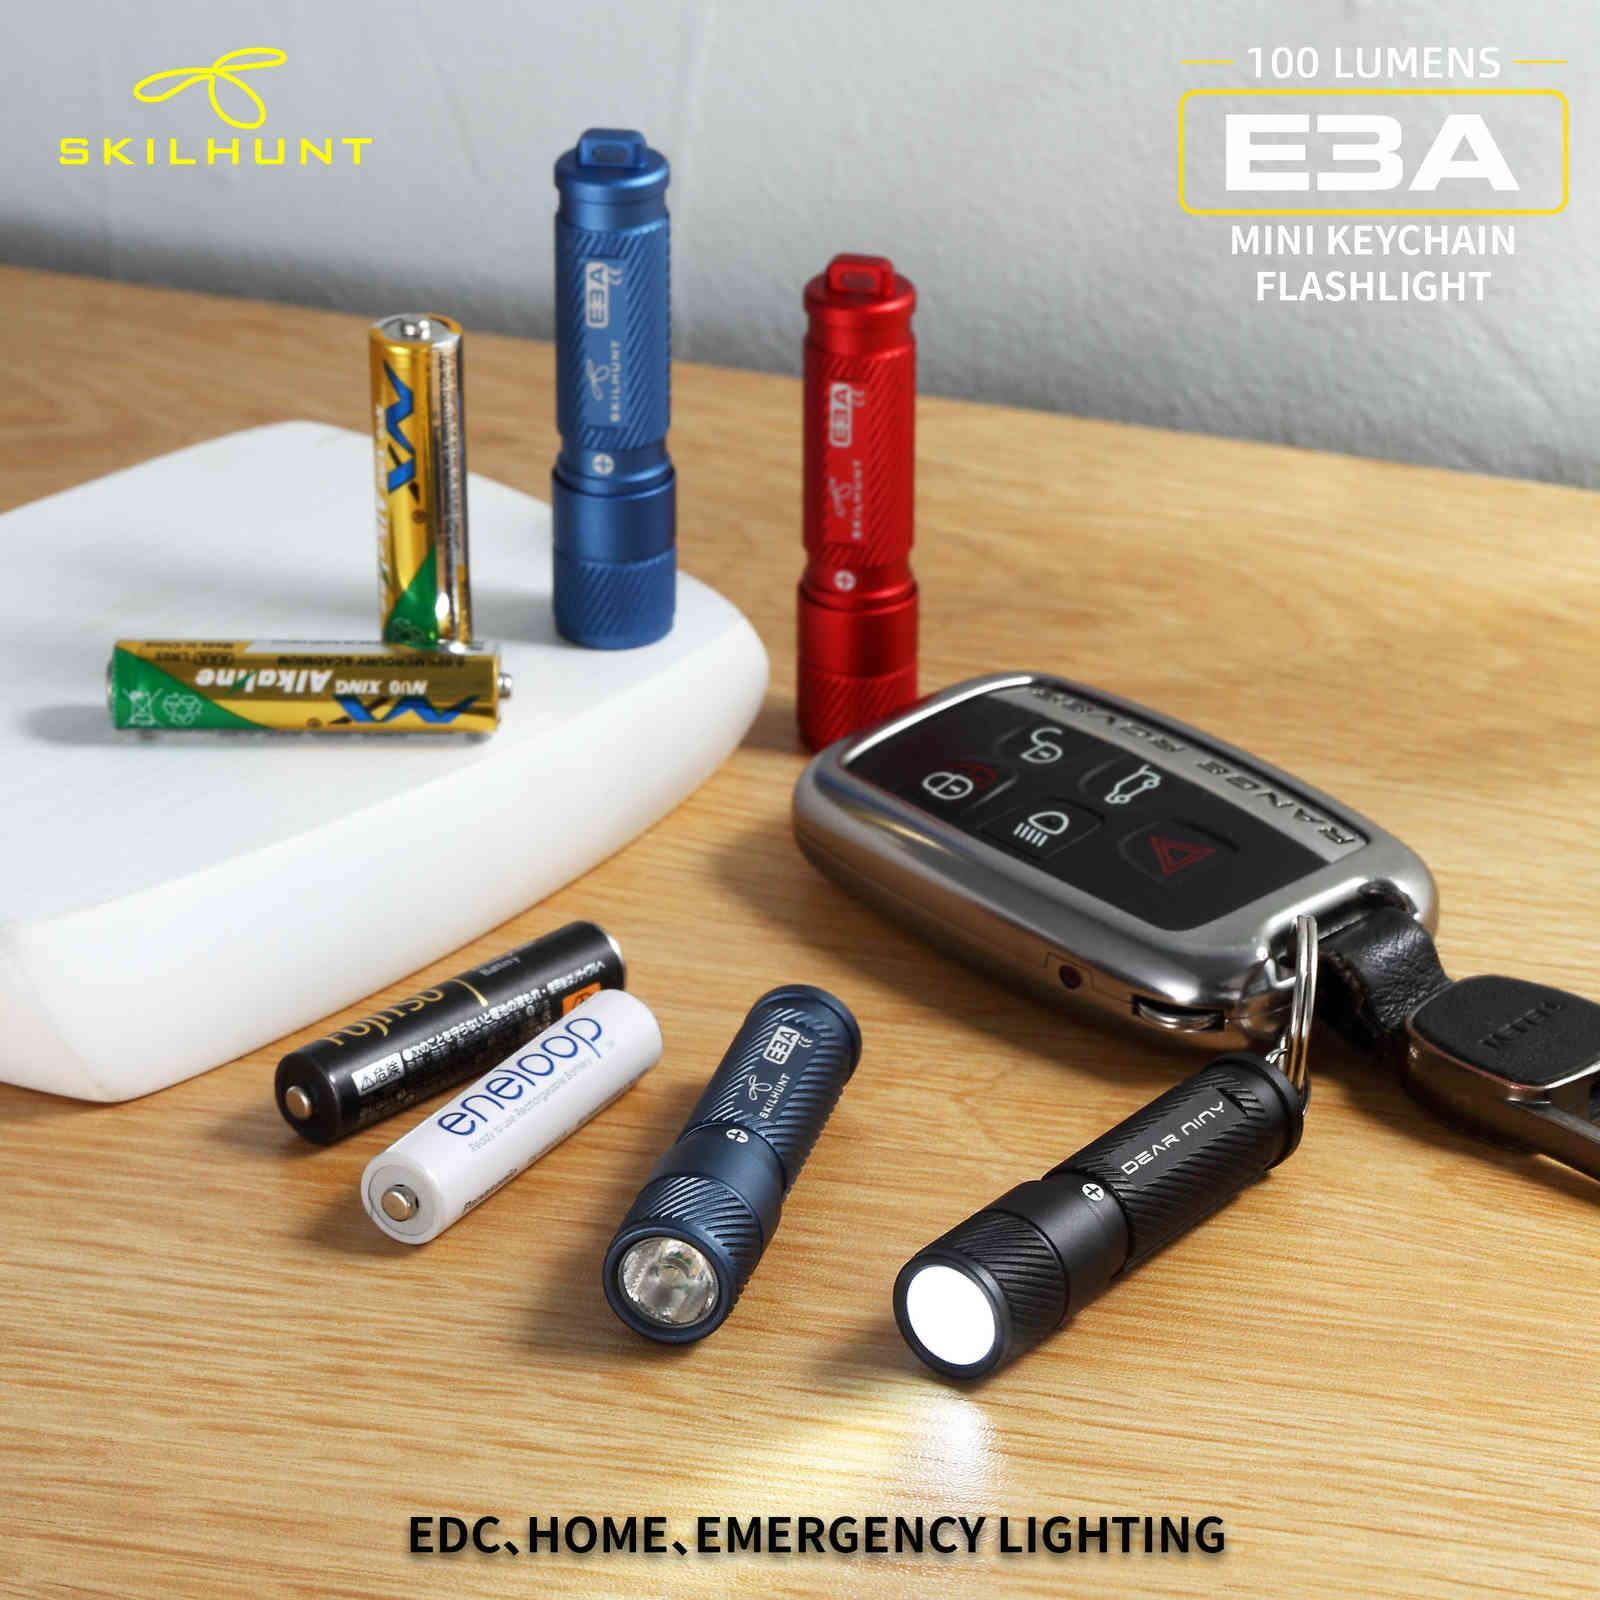 Novo Skilhunt E3A 100 Lumens AAA Keychain LED Lanterna Mini LED Chave Light 210322